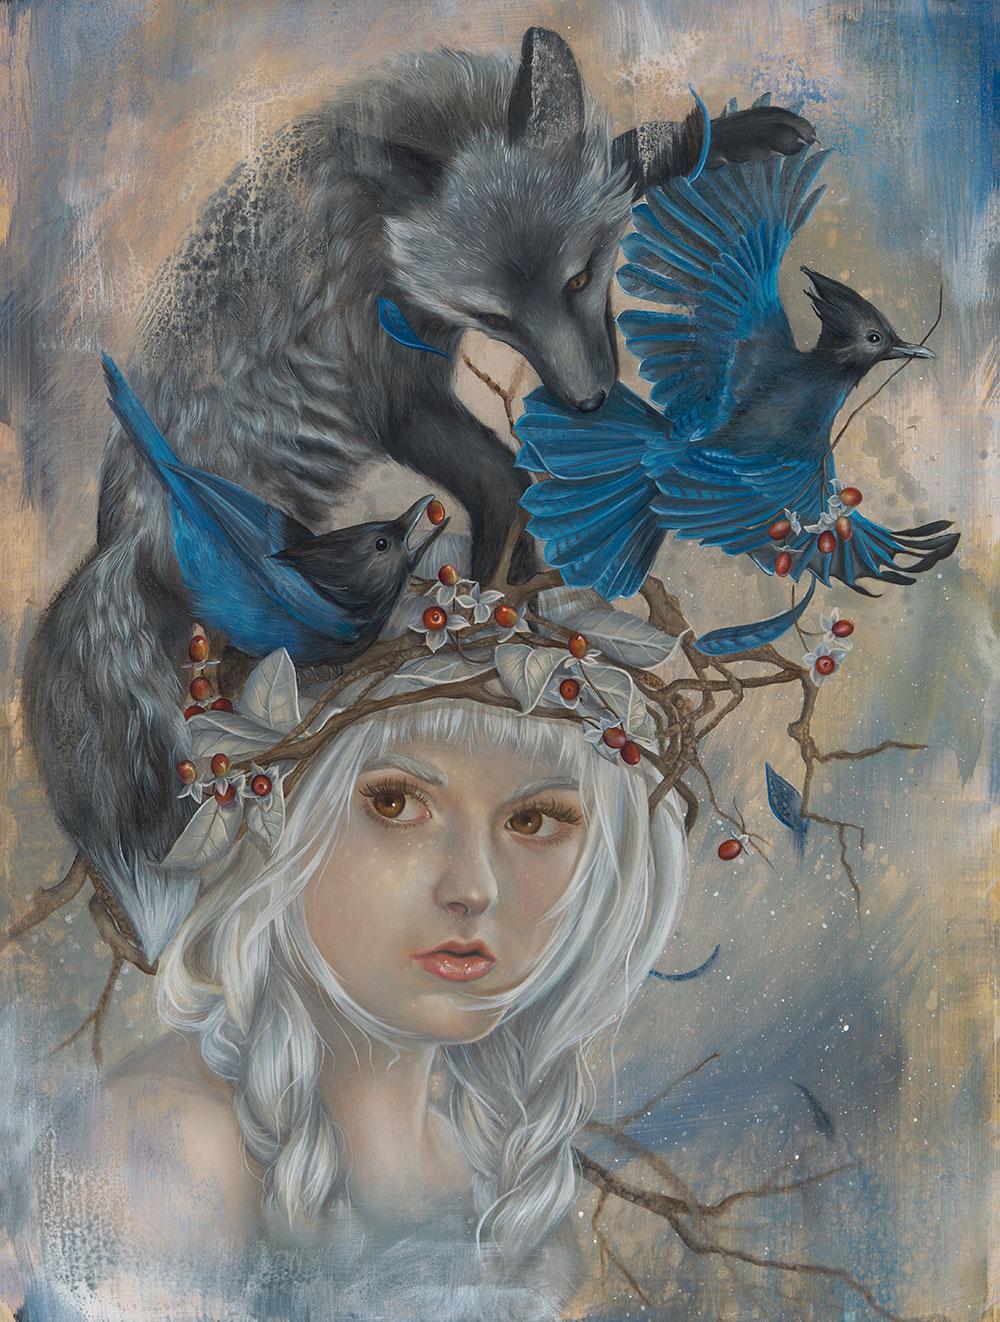 Kari-Lise-Alexander-Here-Amid-the-Wild-Woods-web